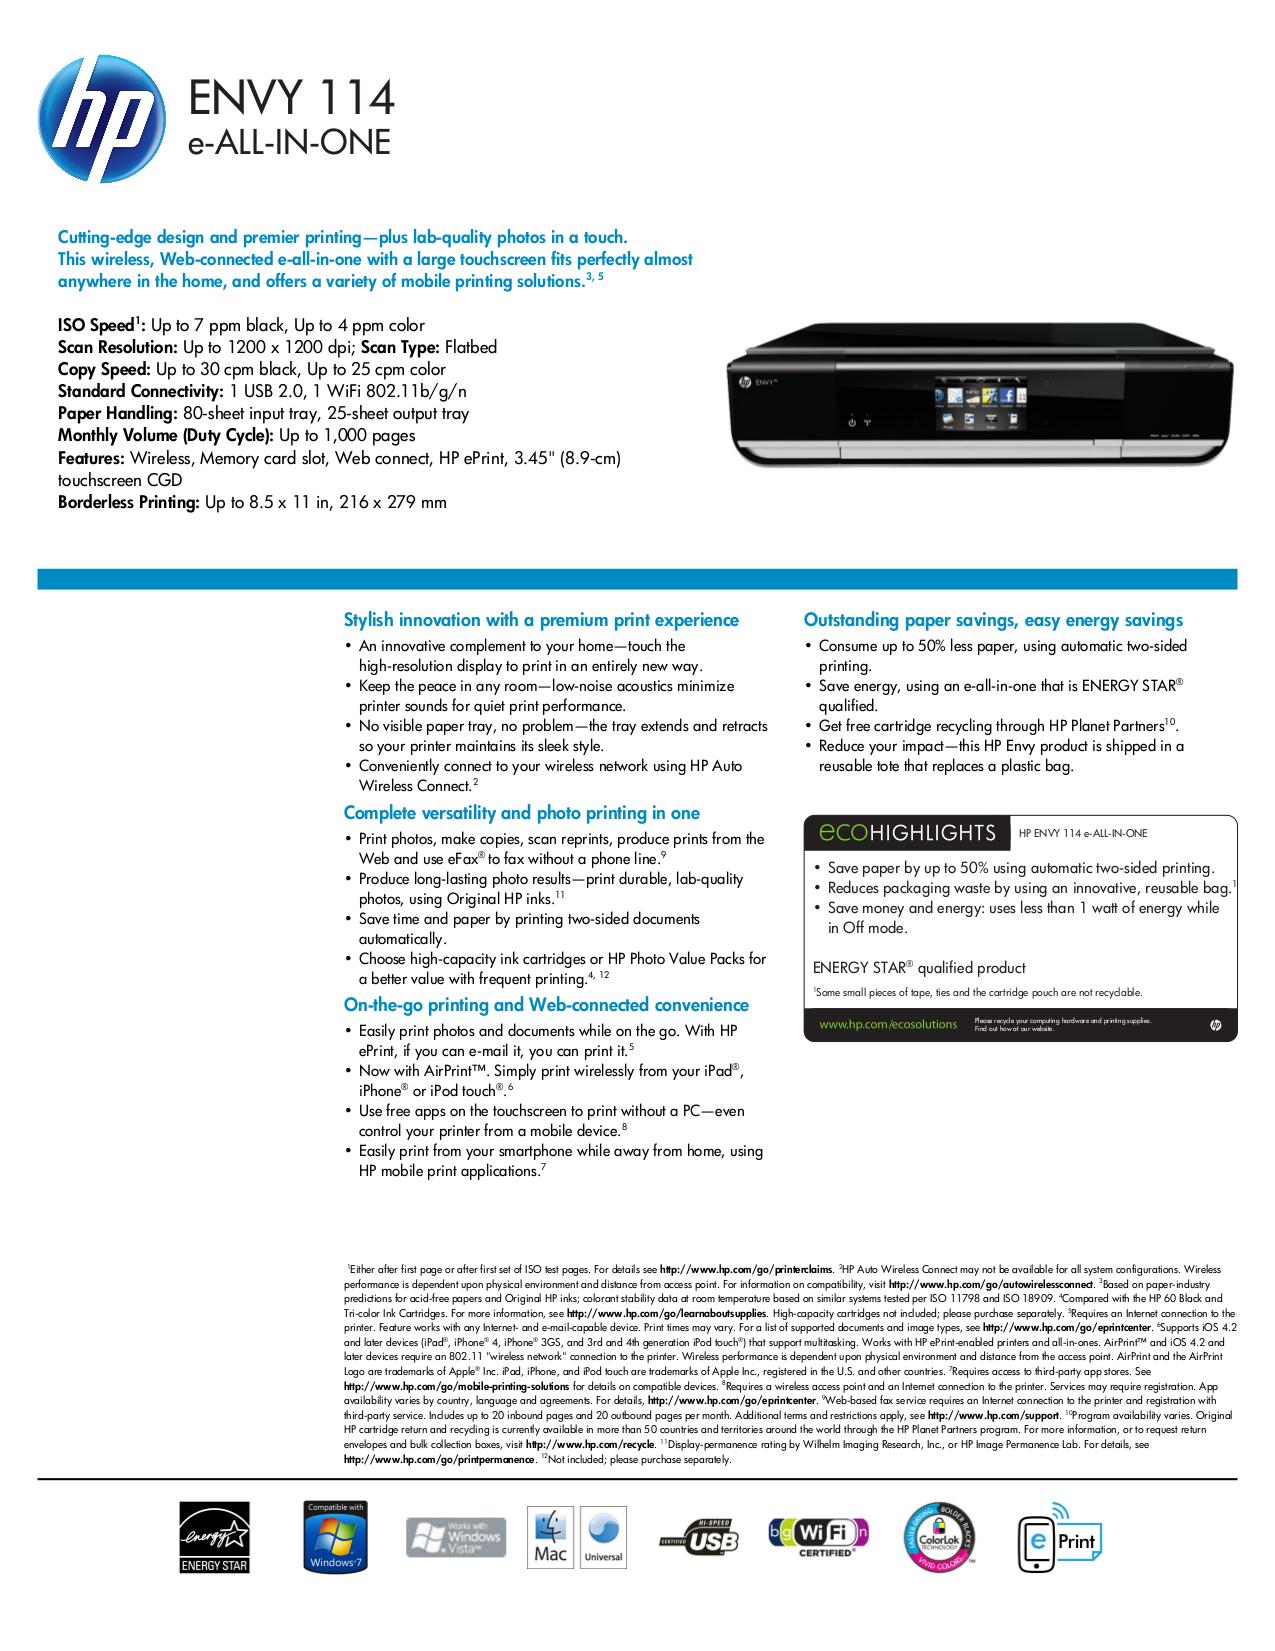 download free pdf for hp envy 114 multifunction printer manual rh umlib com hp envy 750-114 manual